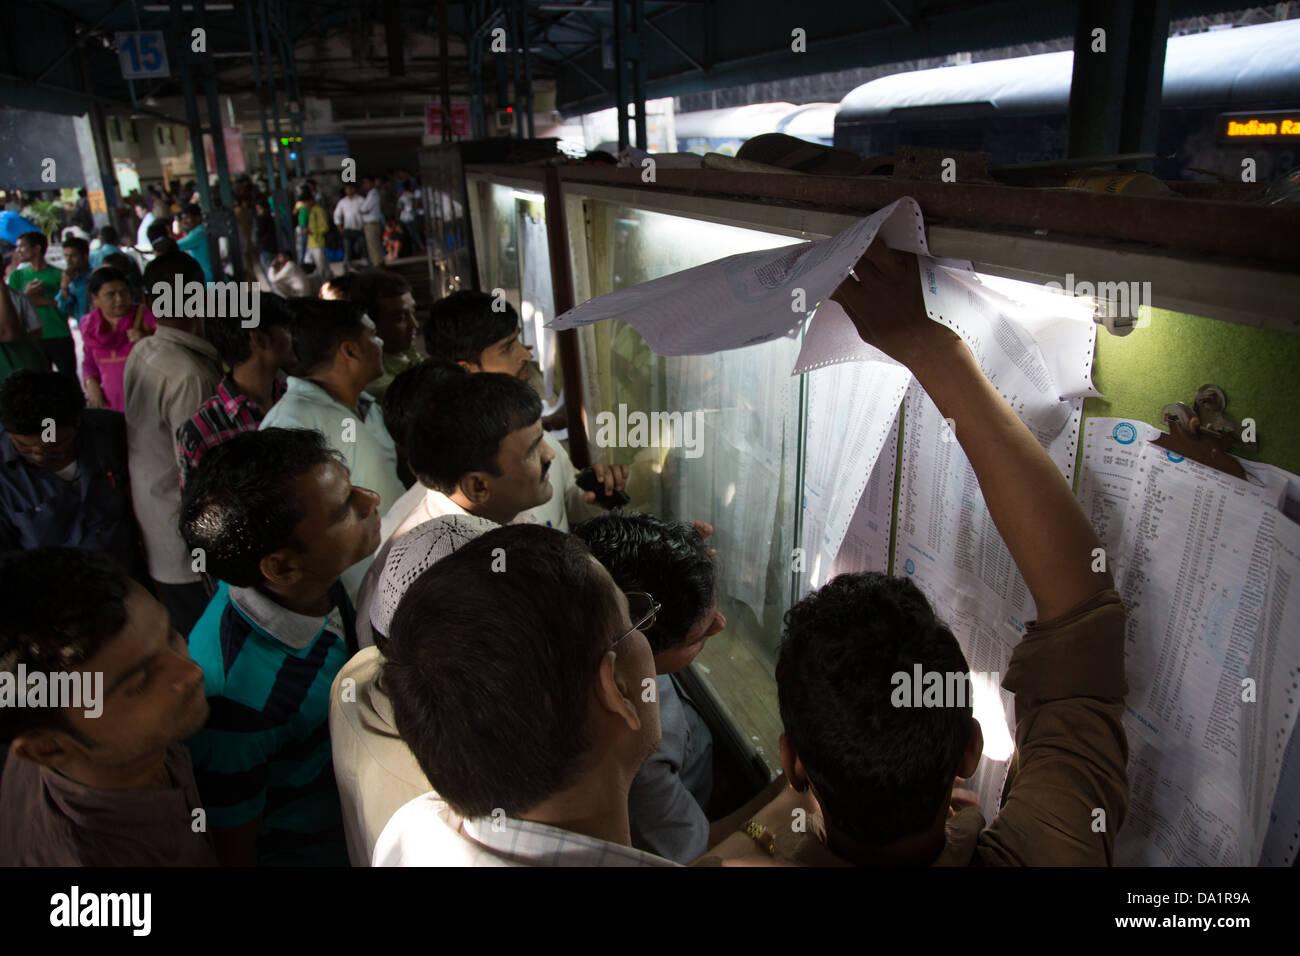 Passengers checking seating and standby lists at Chattrapati Shivaji or Victoria Terminus, Mumbai, India - Stock Image